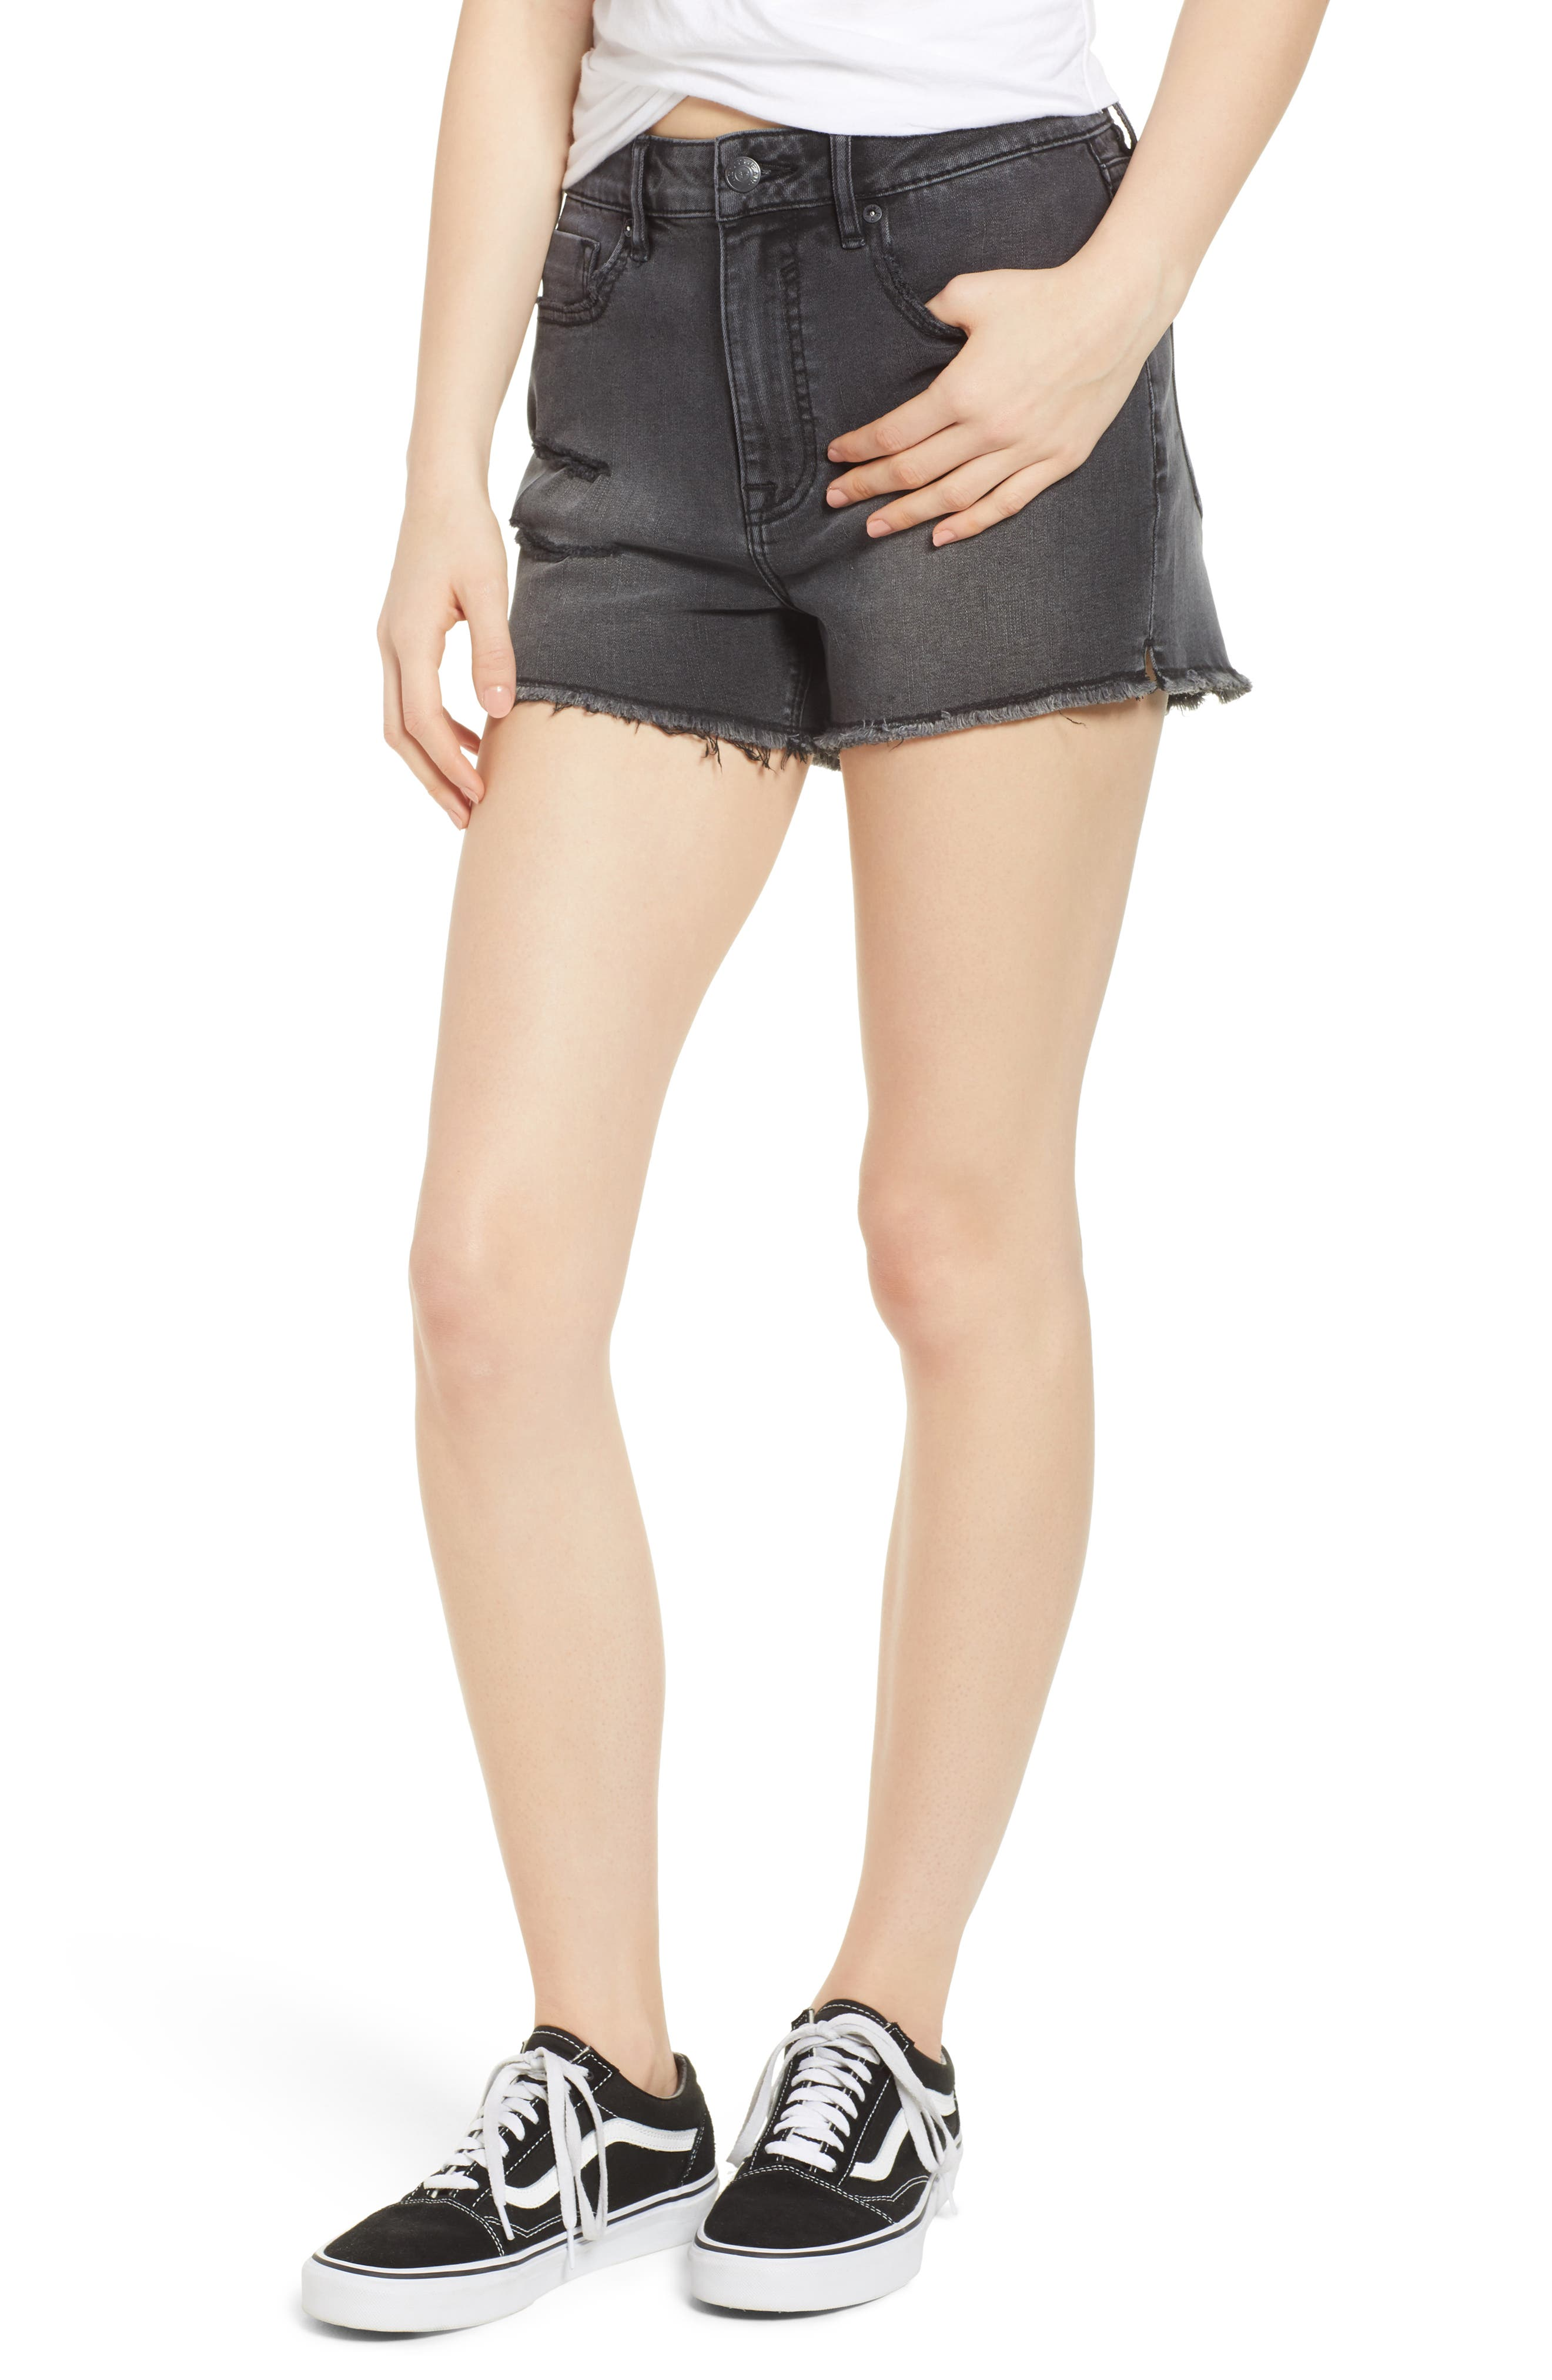 Jagger High Waist Denim Shorts,                         Main,                         color, 001